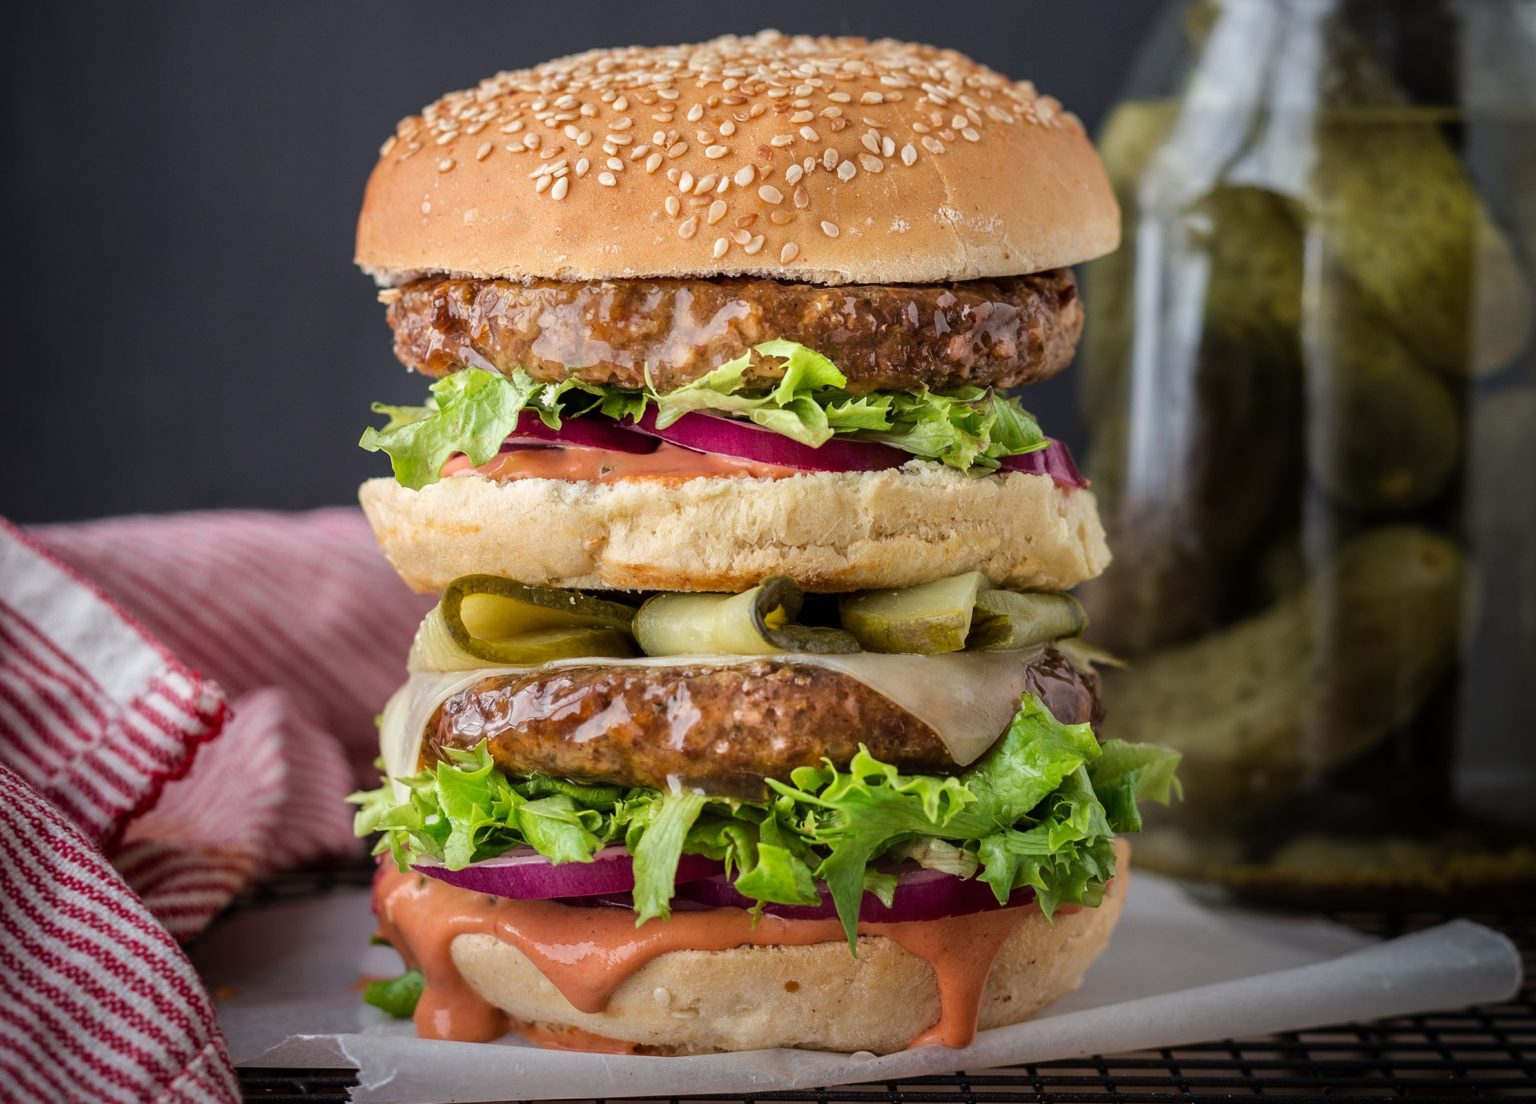 Big Macfry Burgers